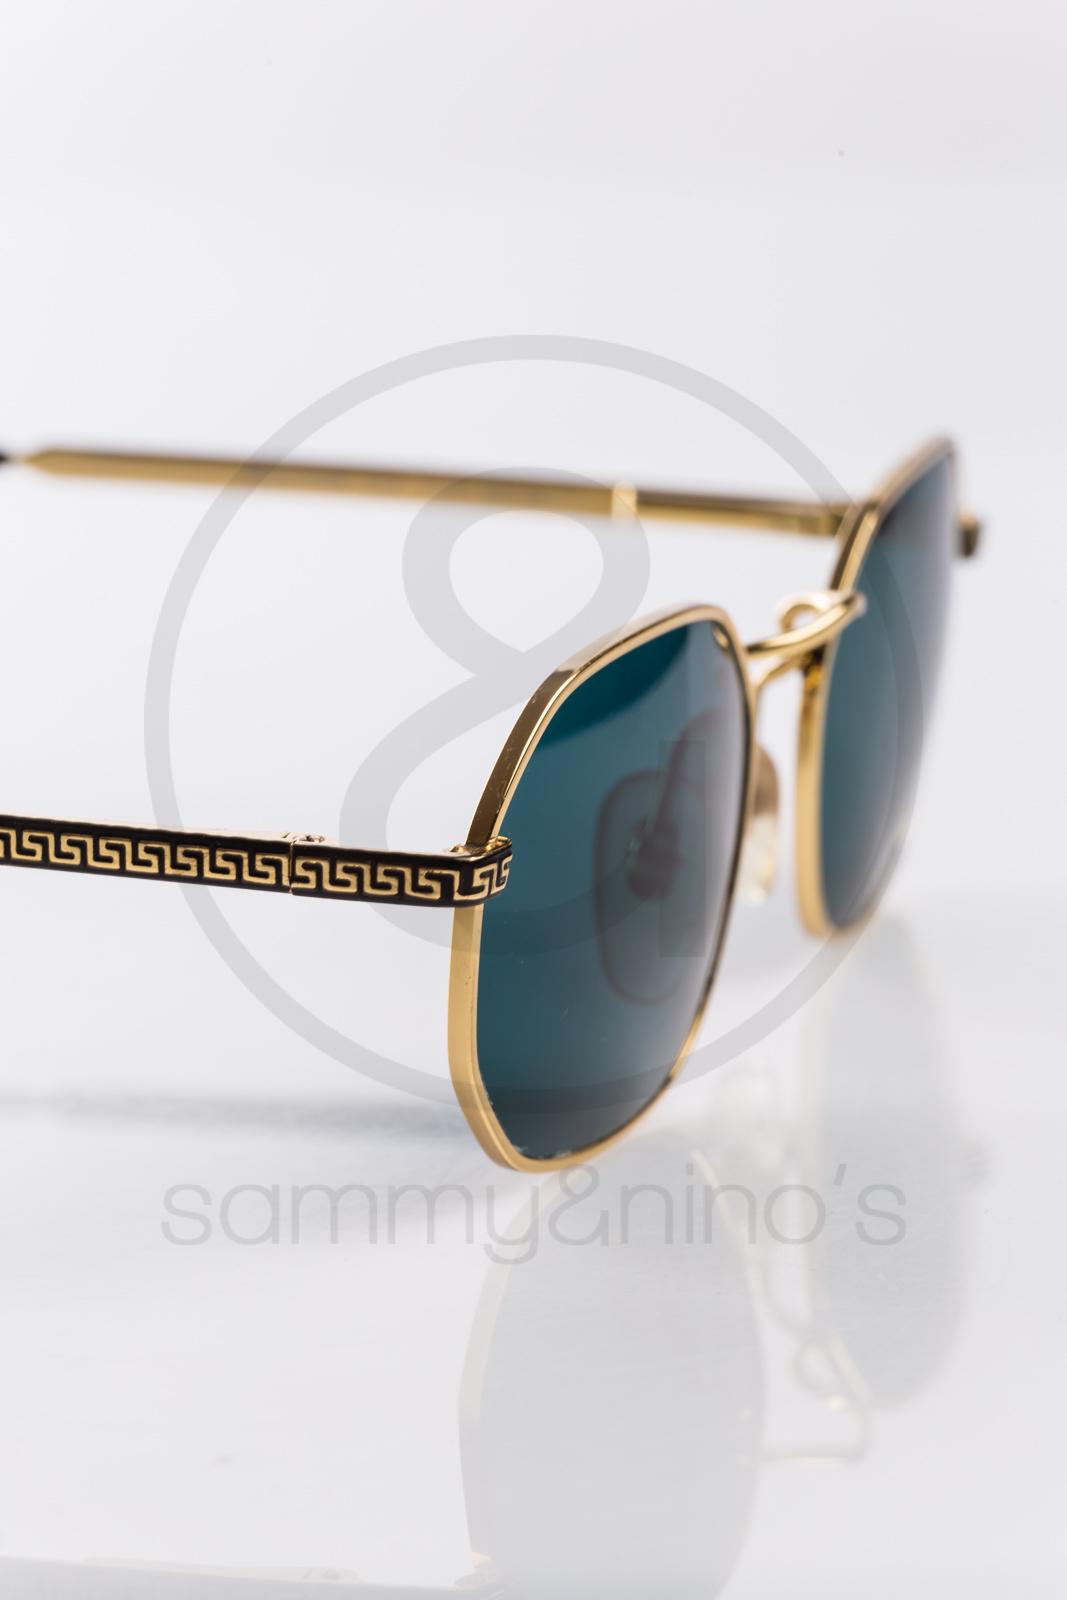 f05b1907c19e Vintage Versace Gold Frame Glasses - Bitterroot Public Library